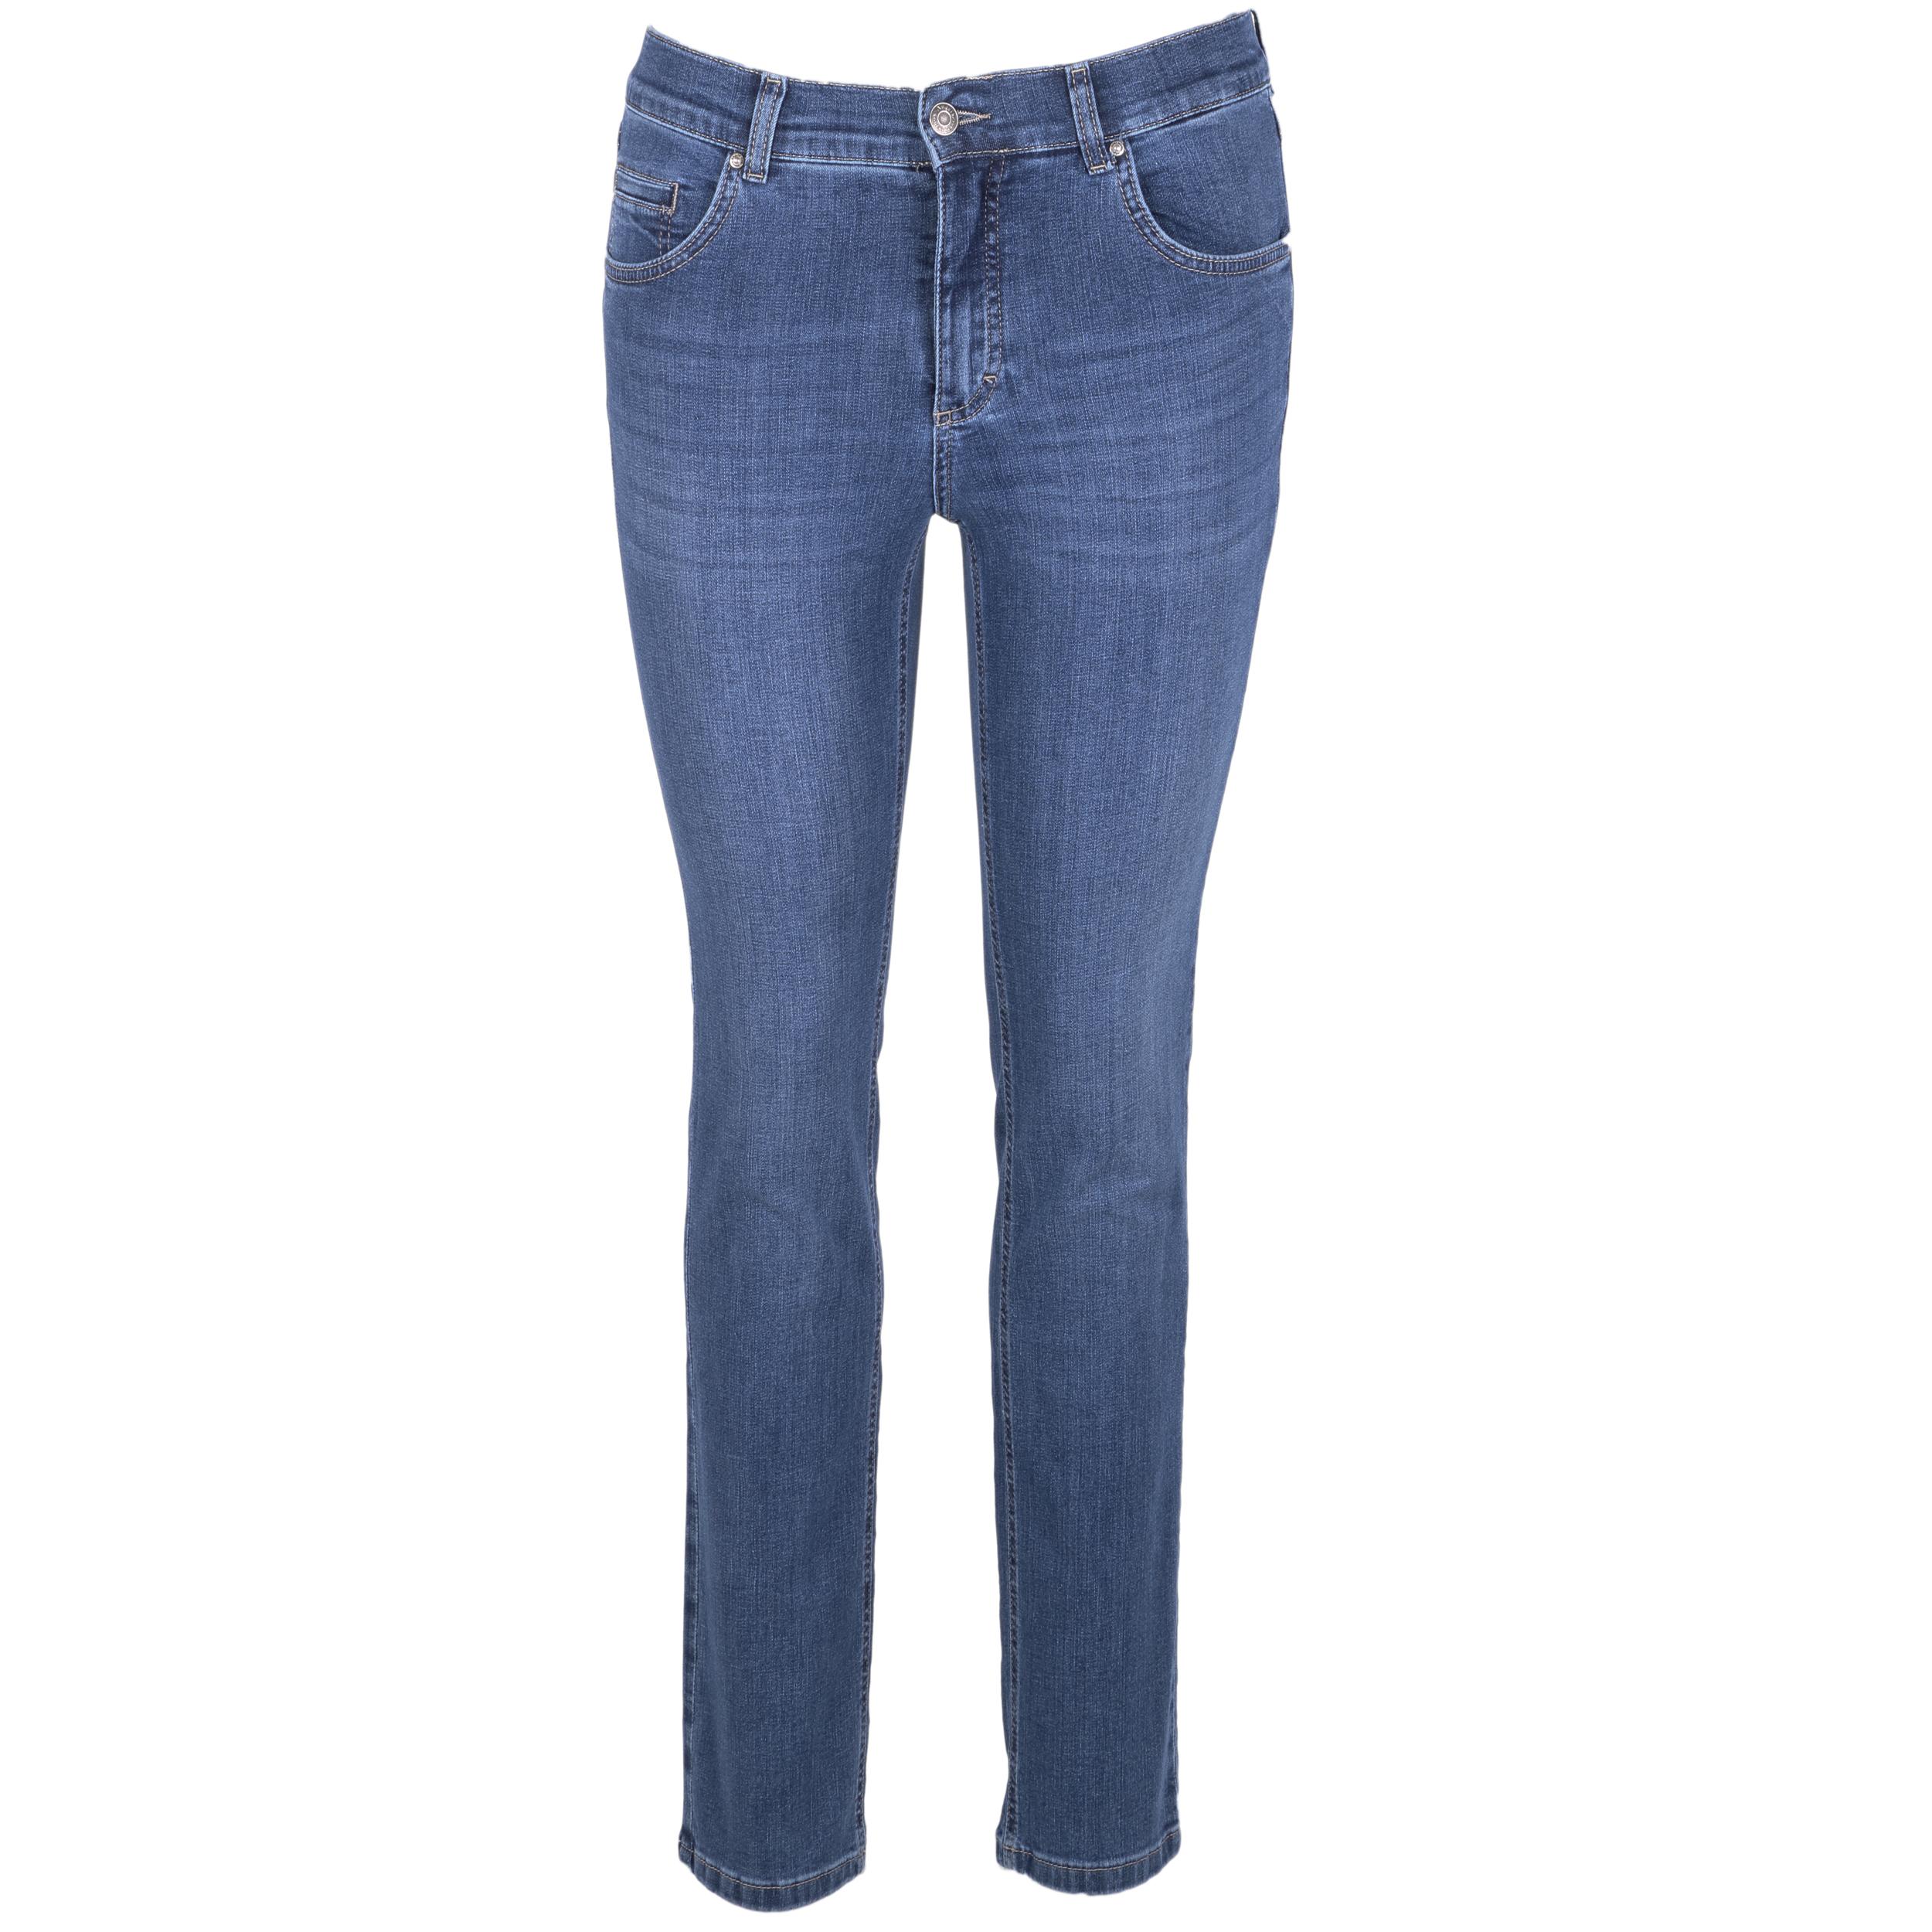 Angels Damen Jeans Cici regular - mid blue